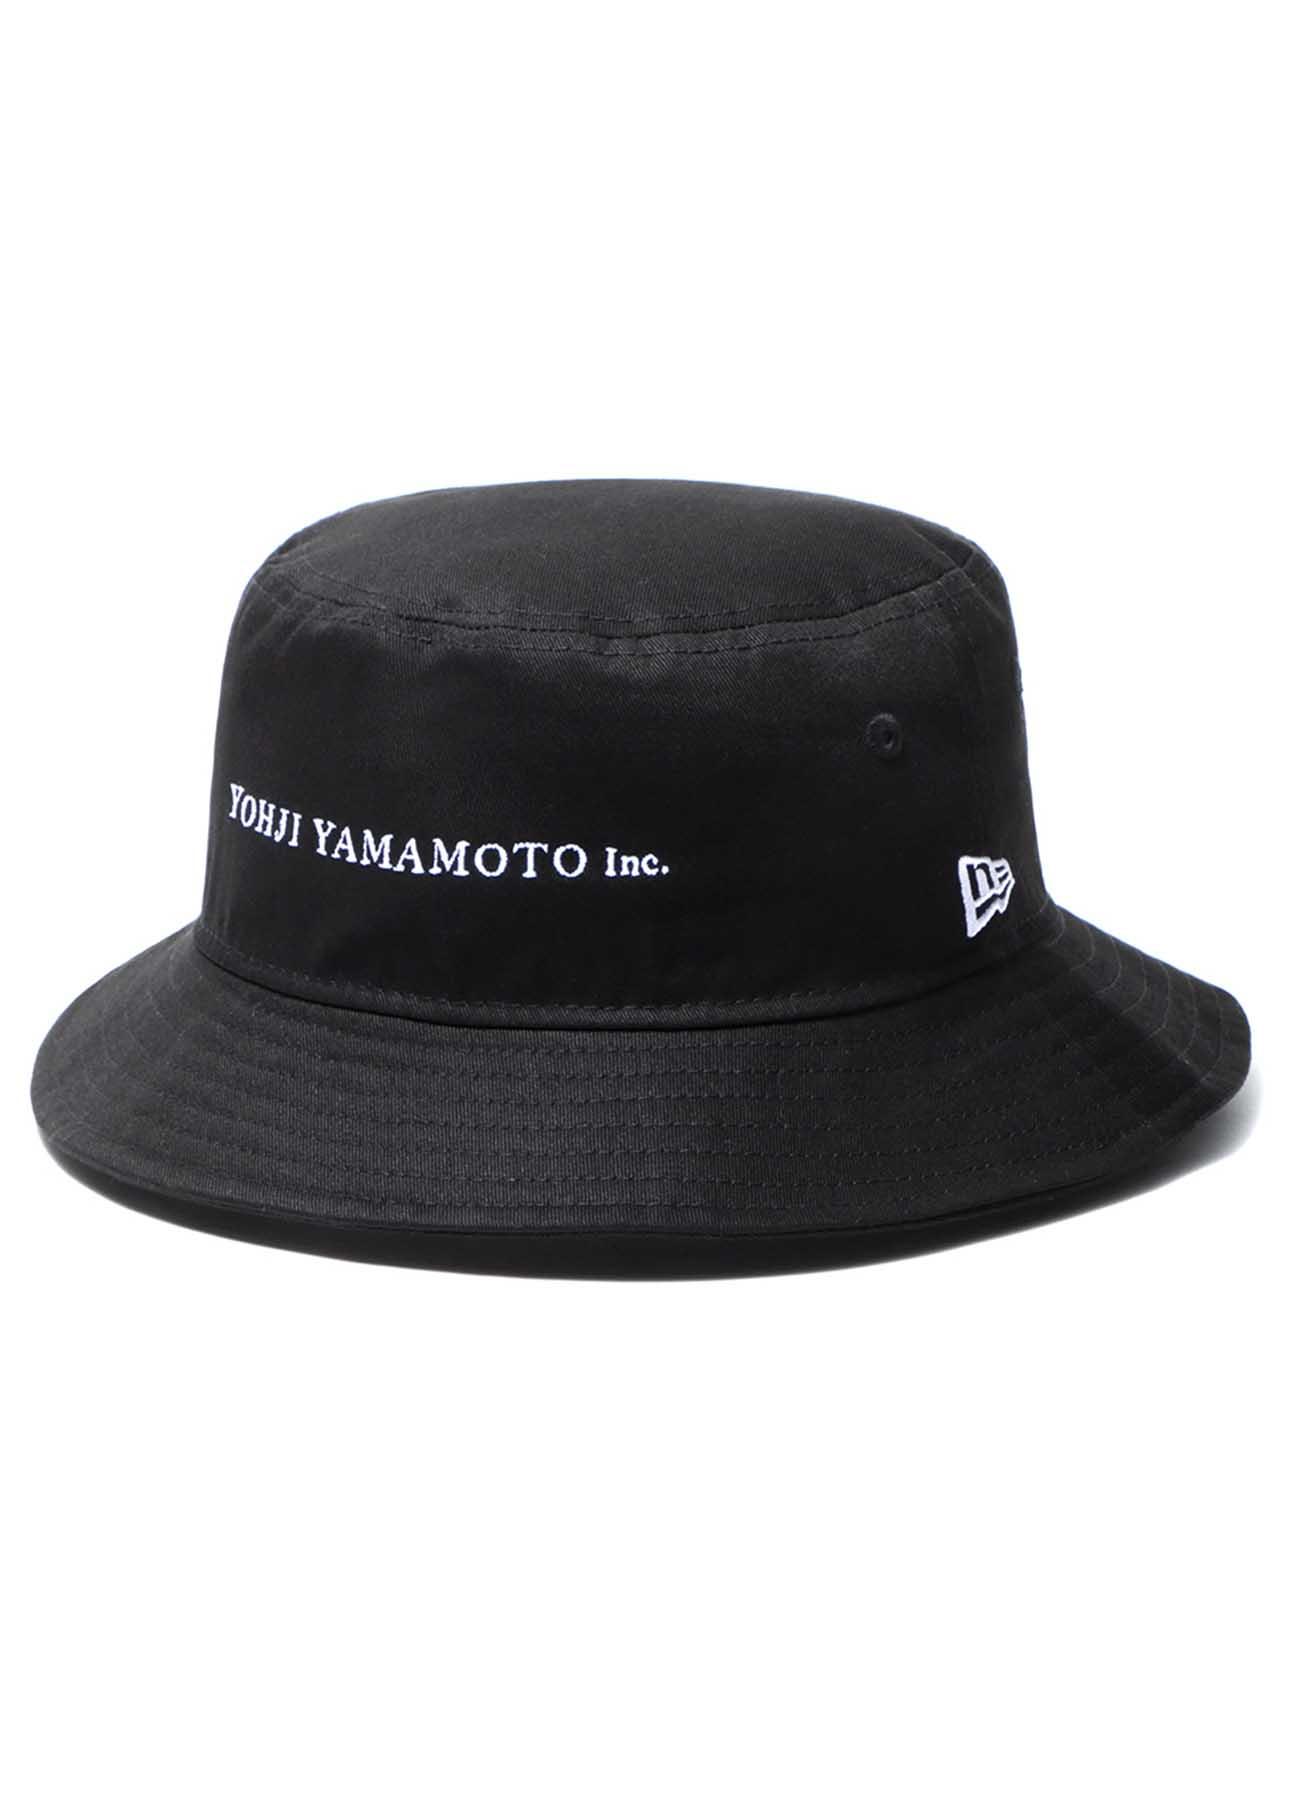 <Yohji Yamamoto All Brands Series> Bucket01